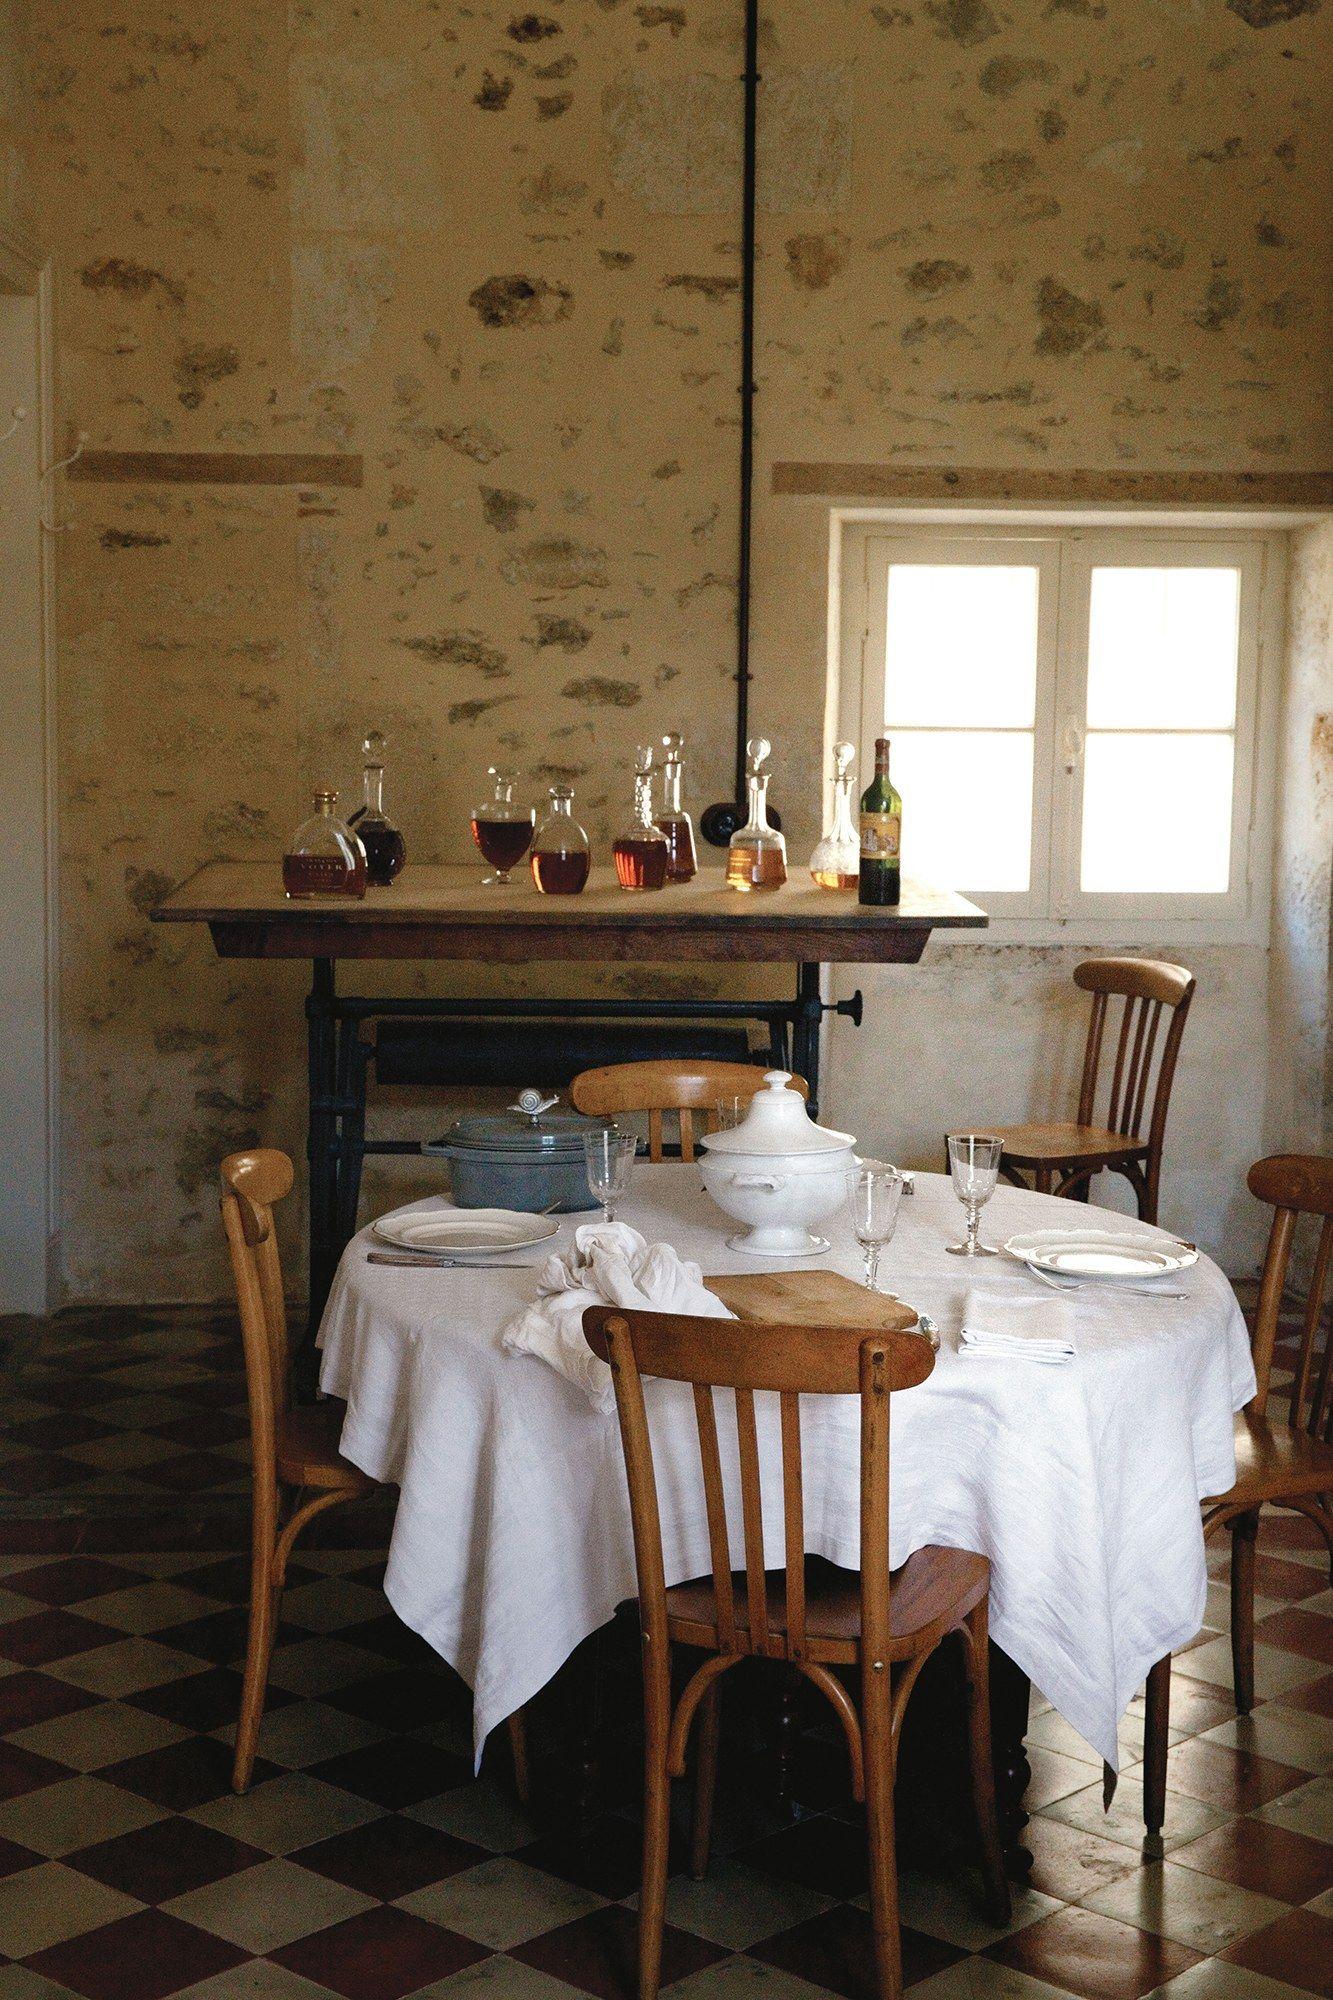 Mimi thorissonus dream kitchen in her french chateau kitchen ideas